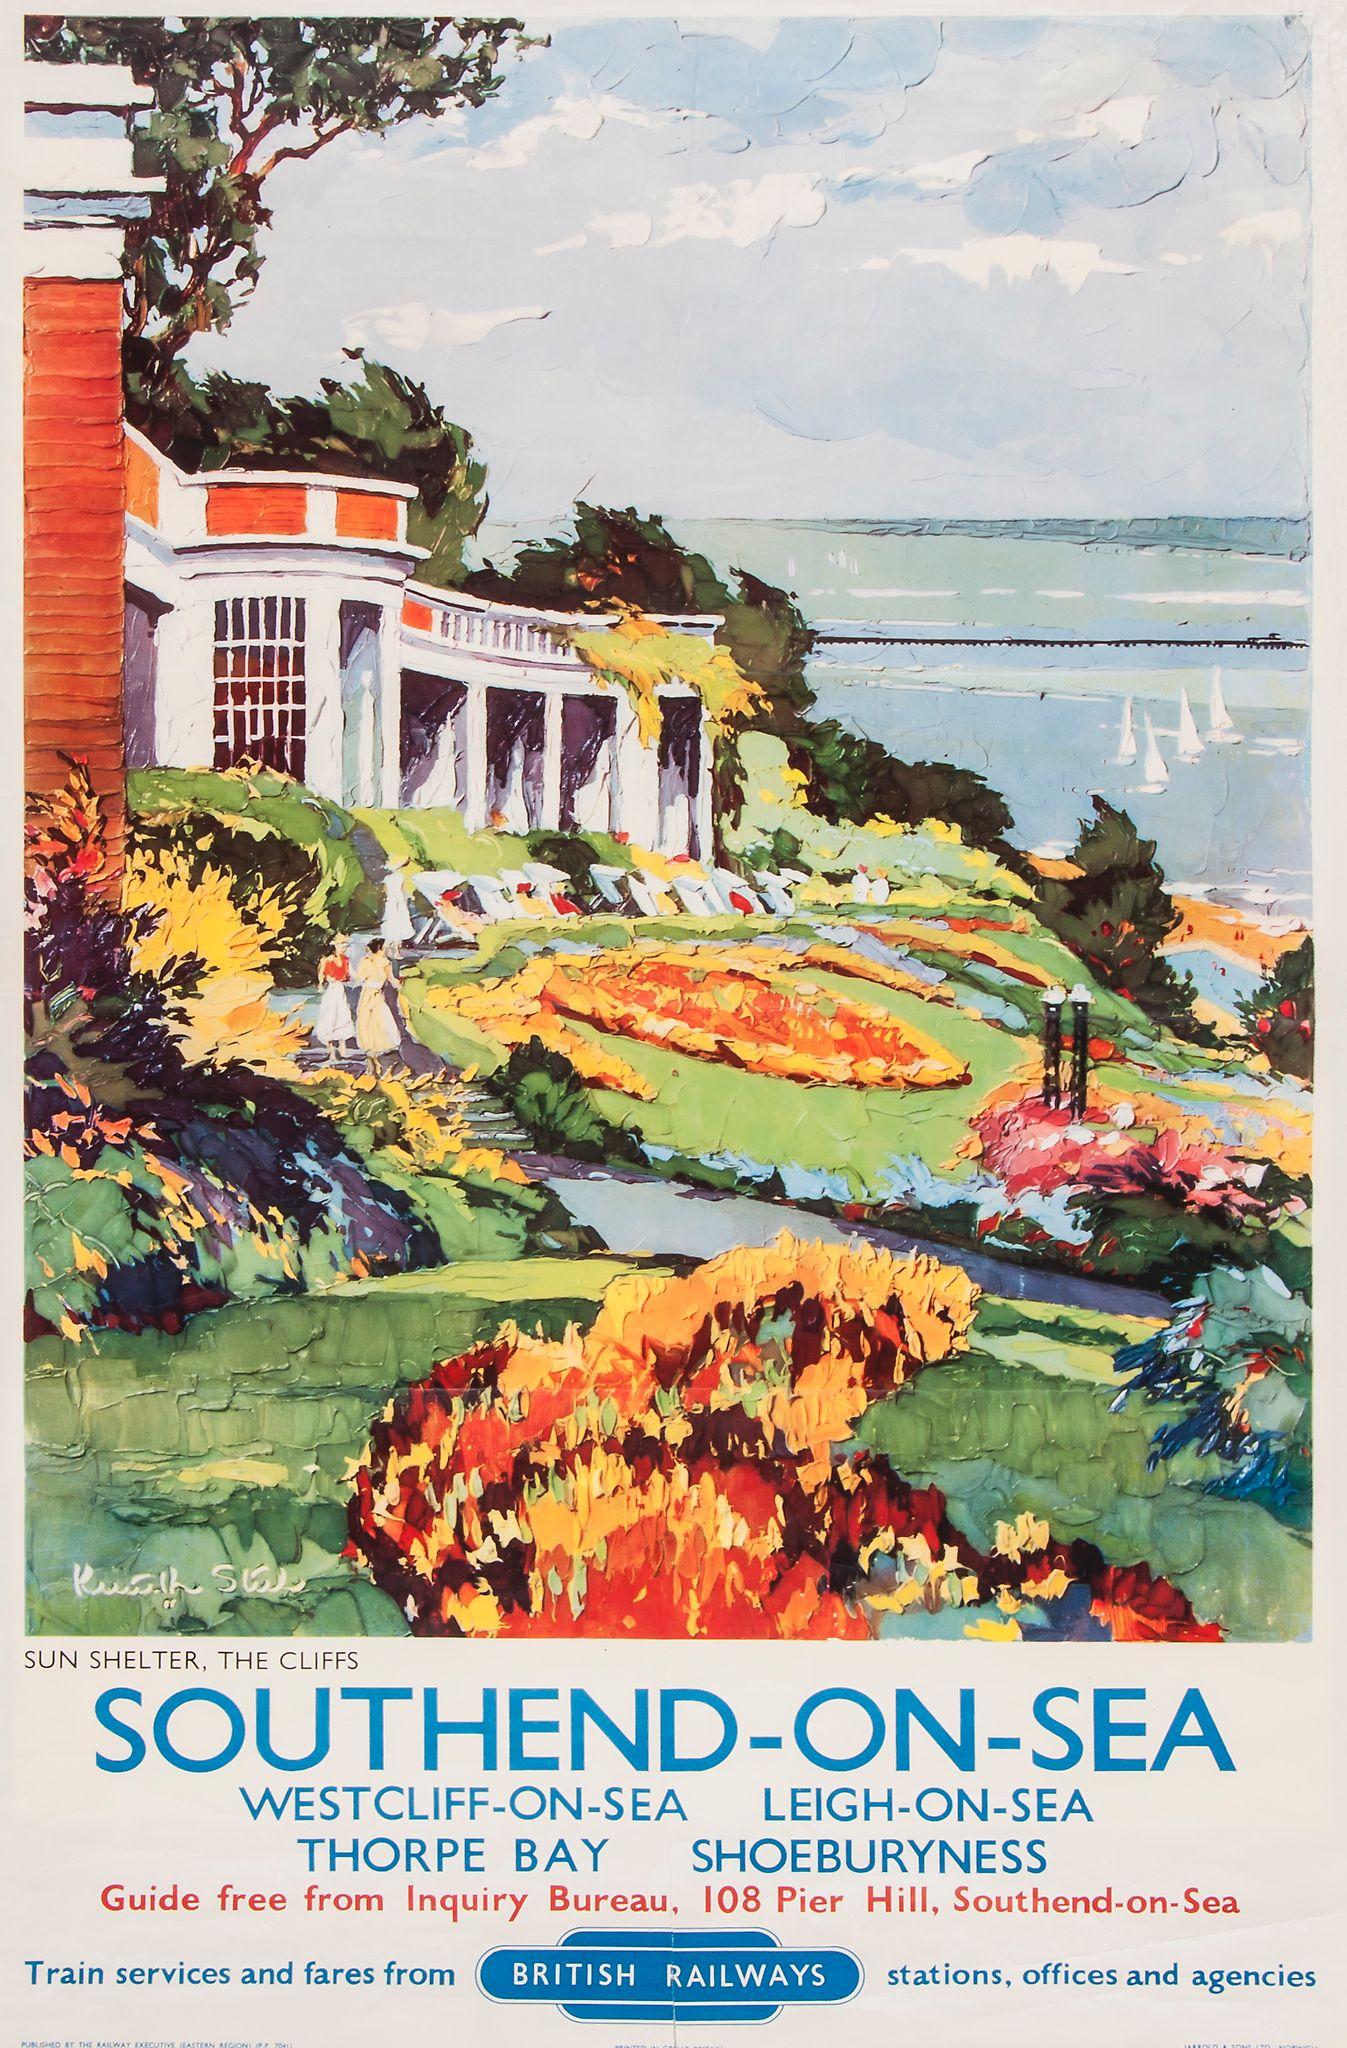 Southend-on-Sea Seaside Poster